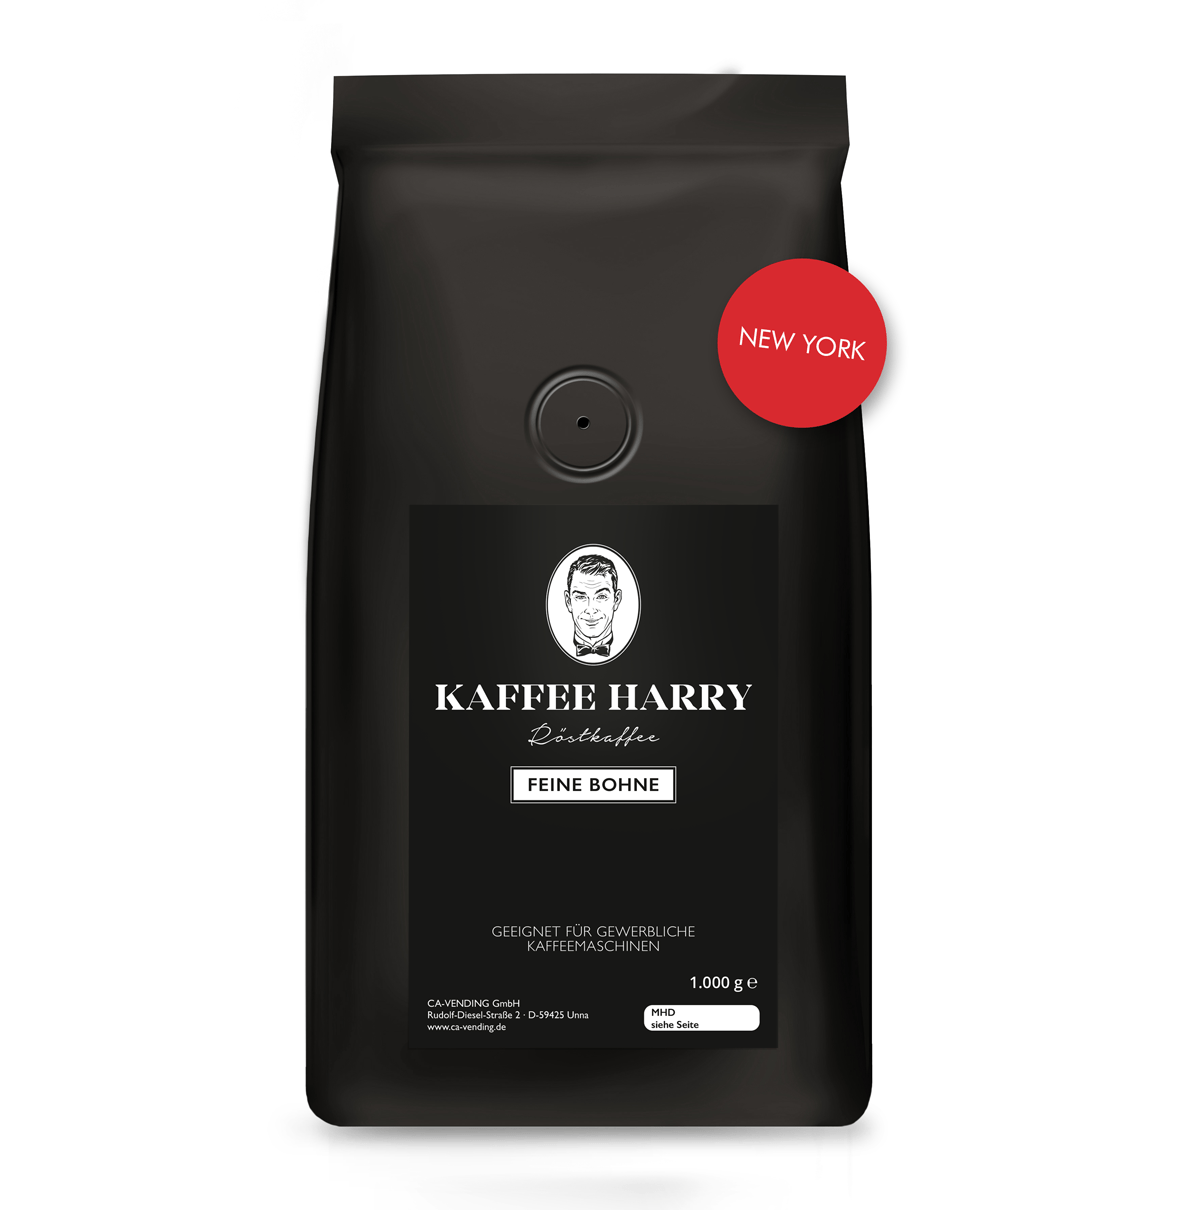 Kaffee Harry - New York